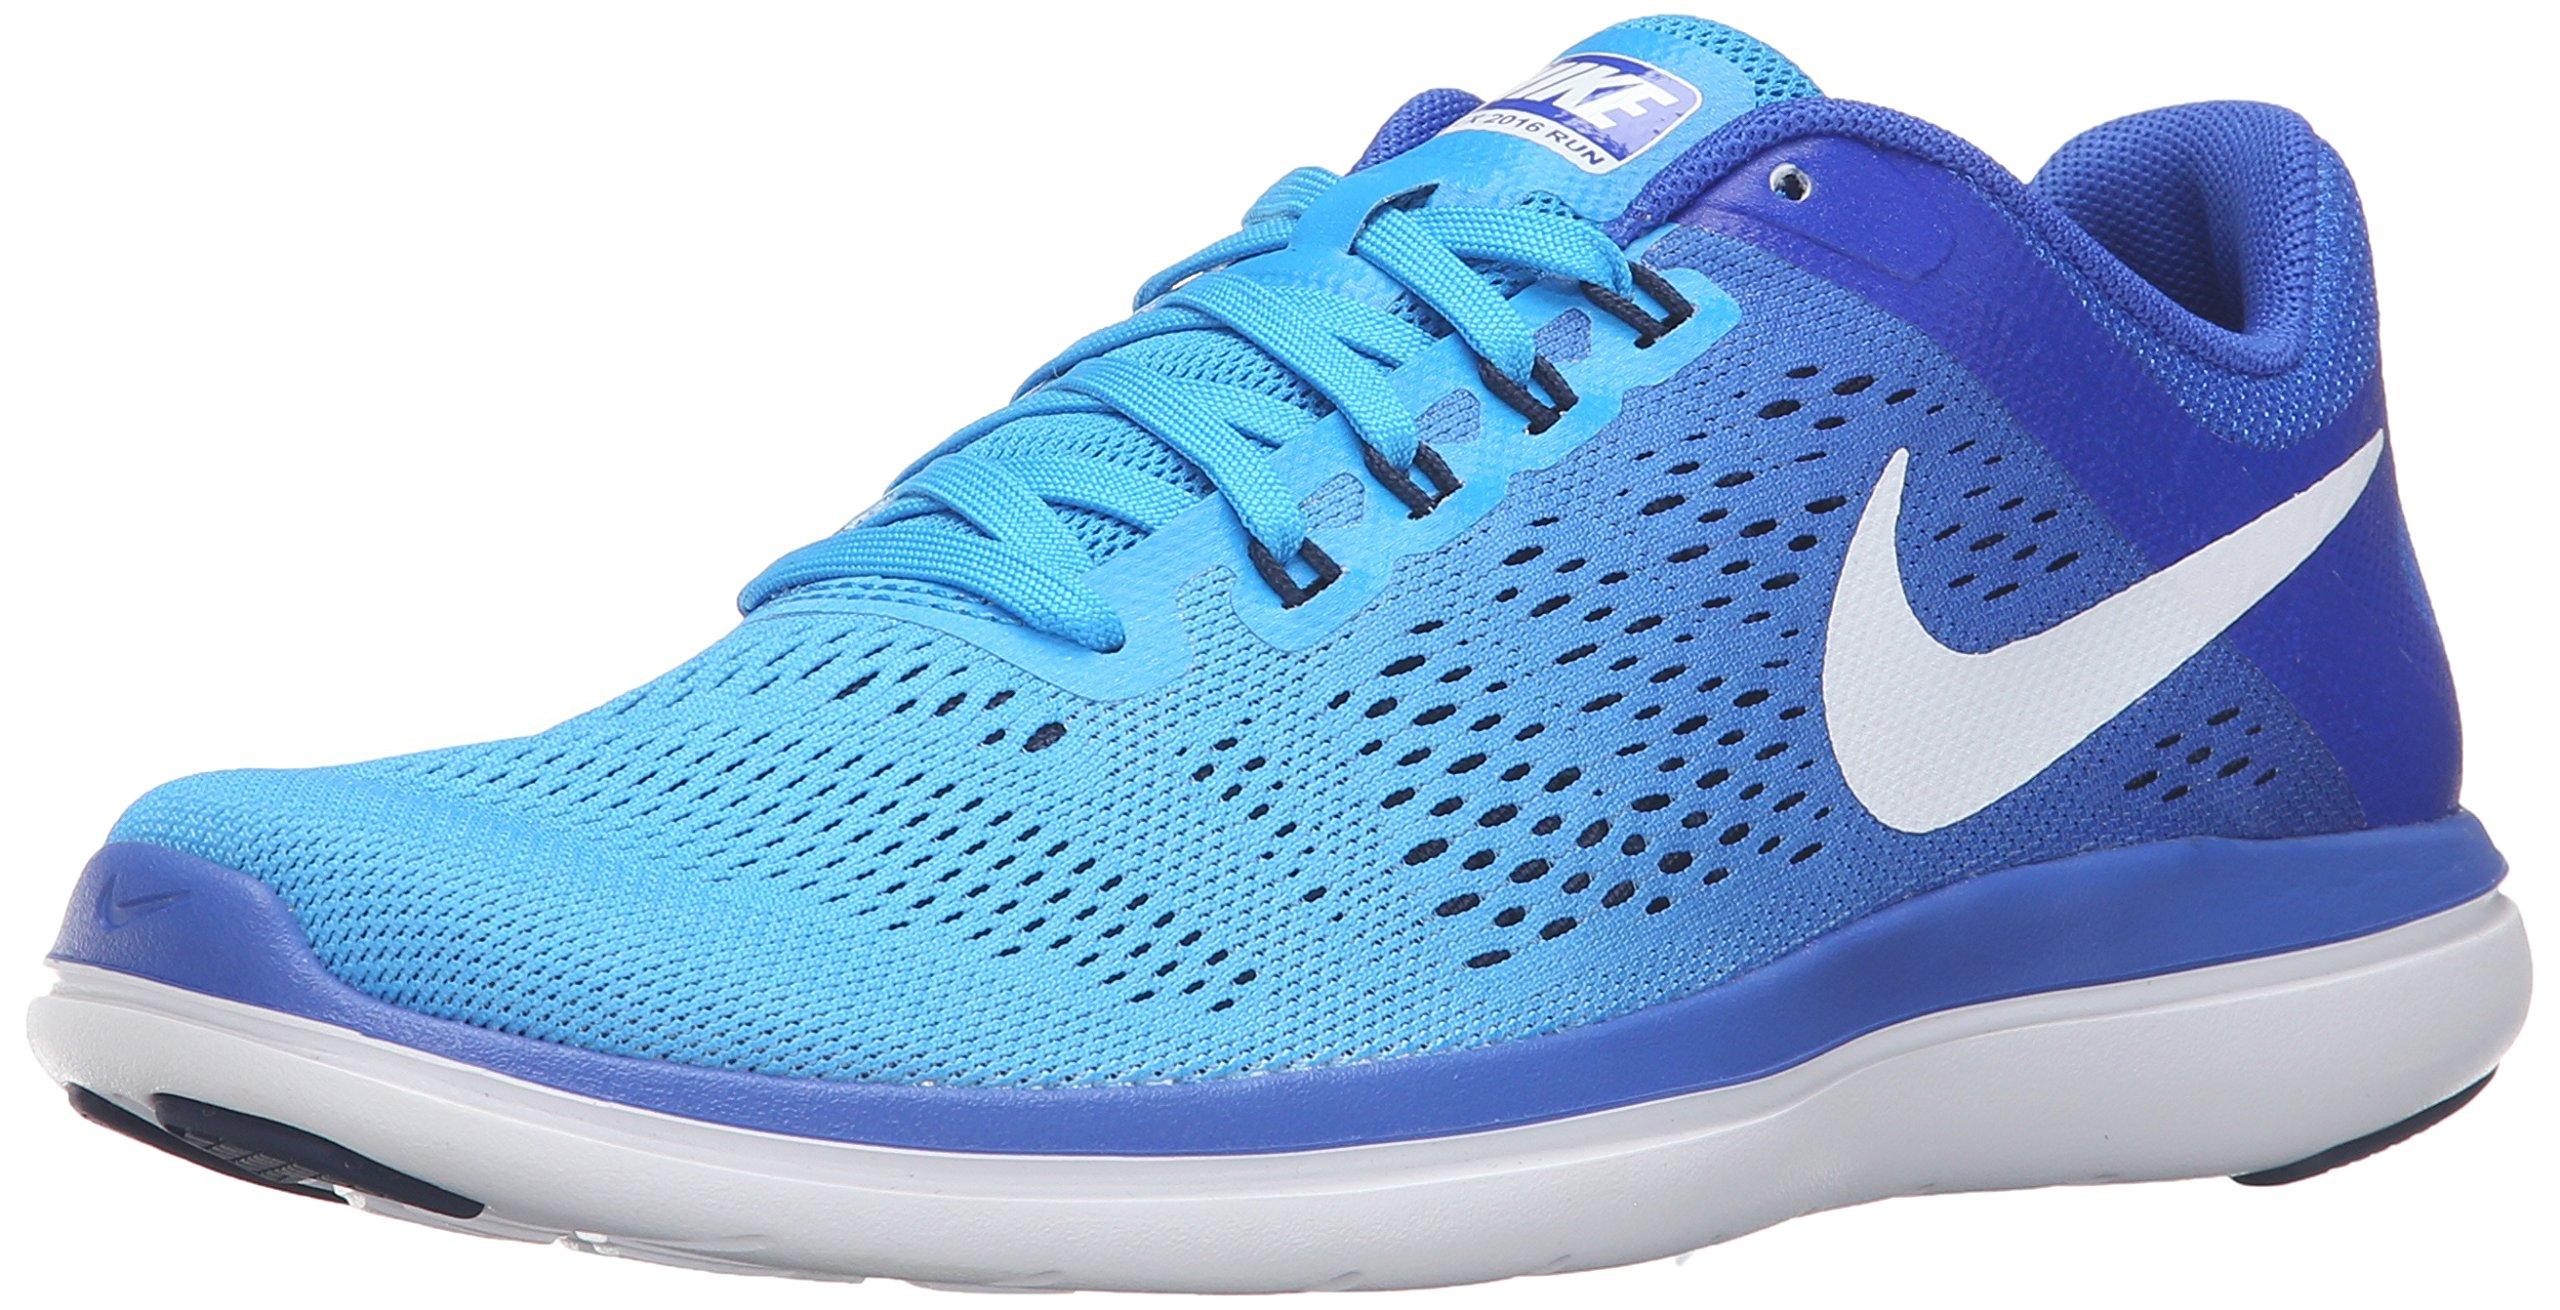 c465045853e Galleon - Nike Women s Flex 2016 RN Running Shoe Glow White Racer  Blue Midnight Navy